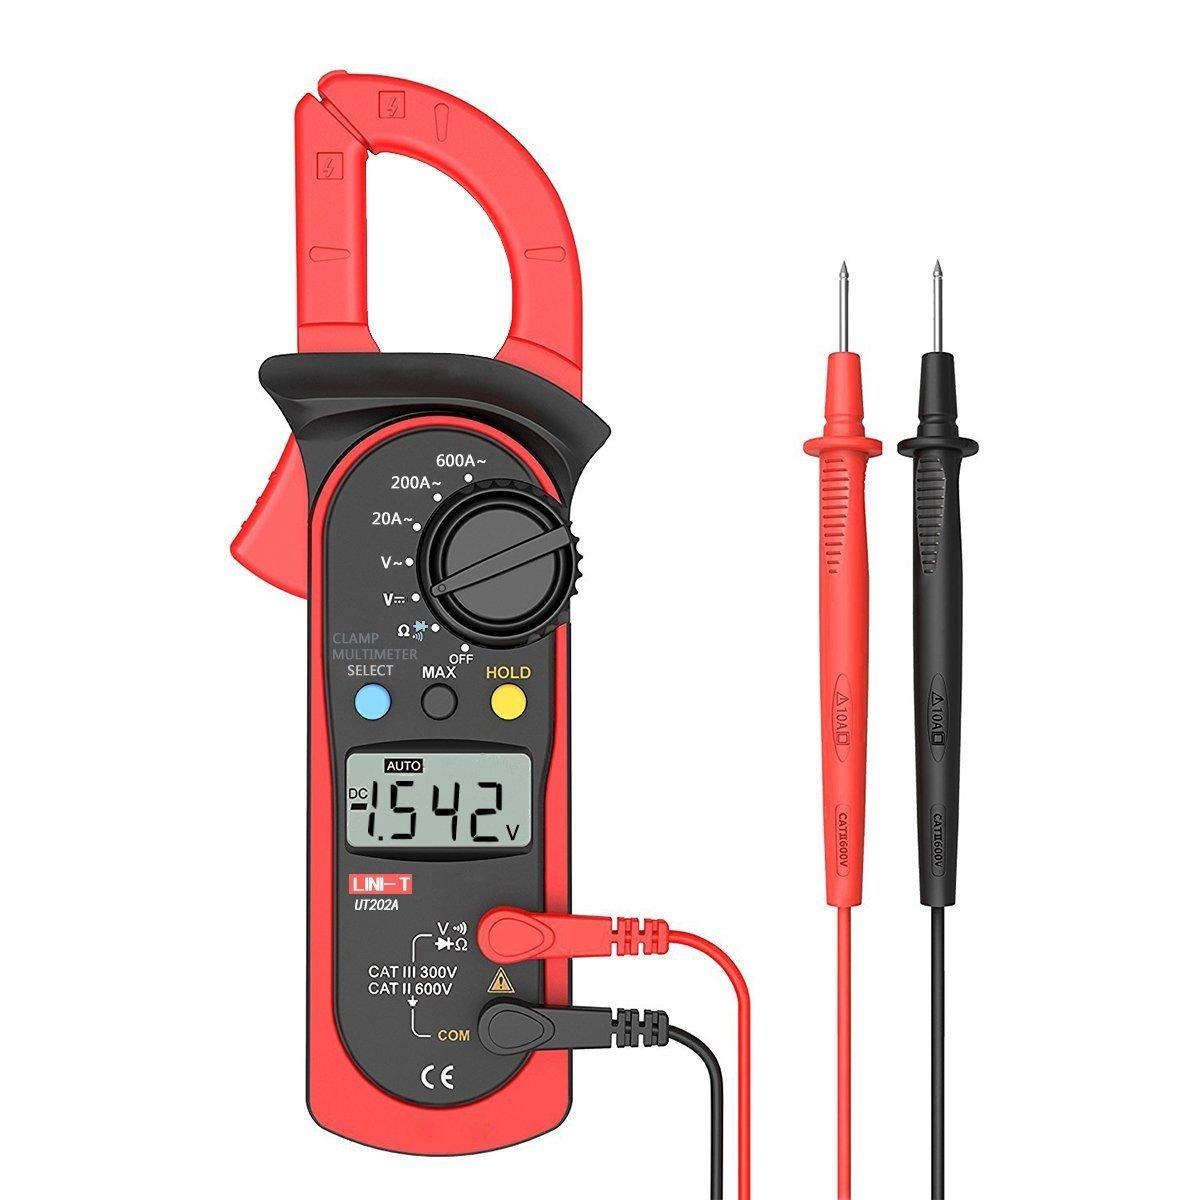 Uni-t UT202A Auto-Ranging Multimeter AC DC 600 Amps Auto/Manual Range Digital Handheld Clamp Meter Test Tool